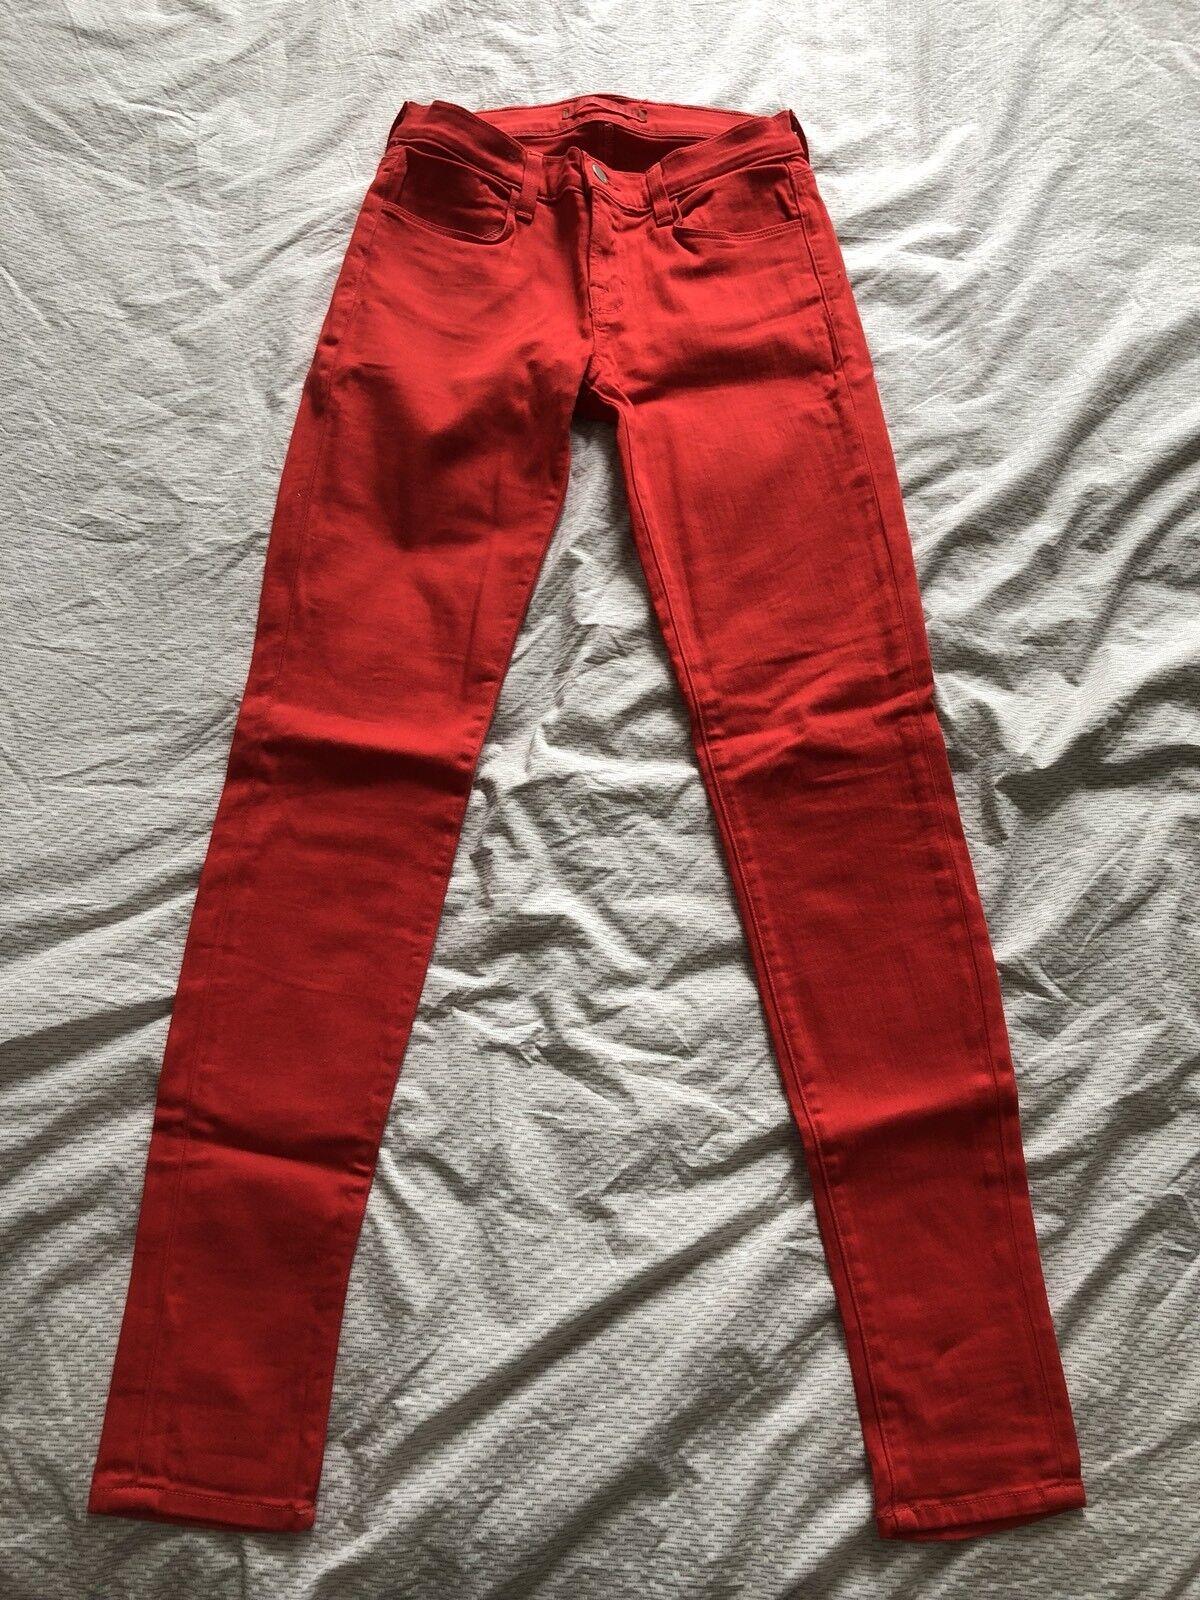 J Brand Red Denim Jeans Hot Pants